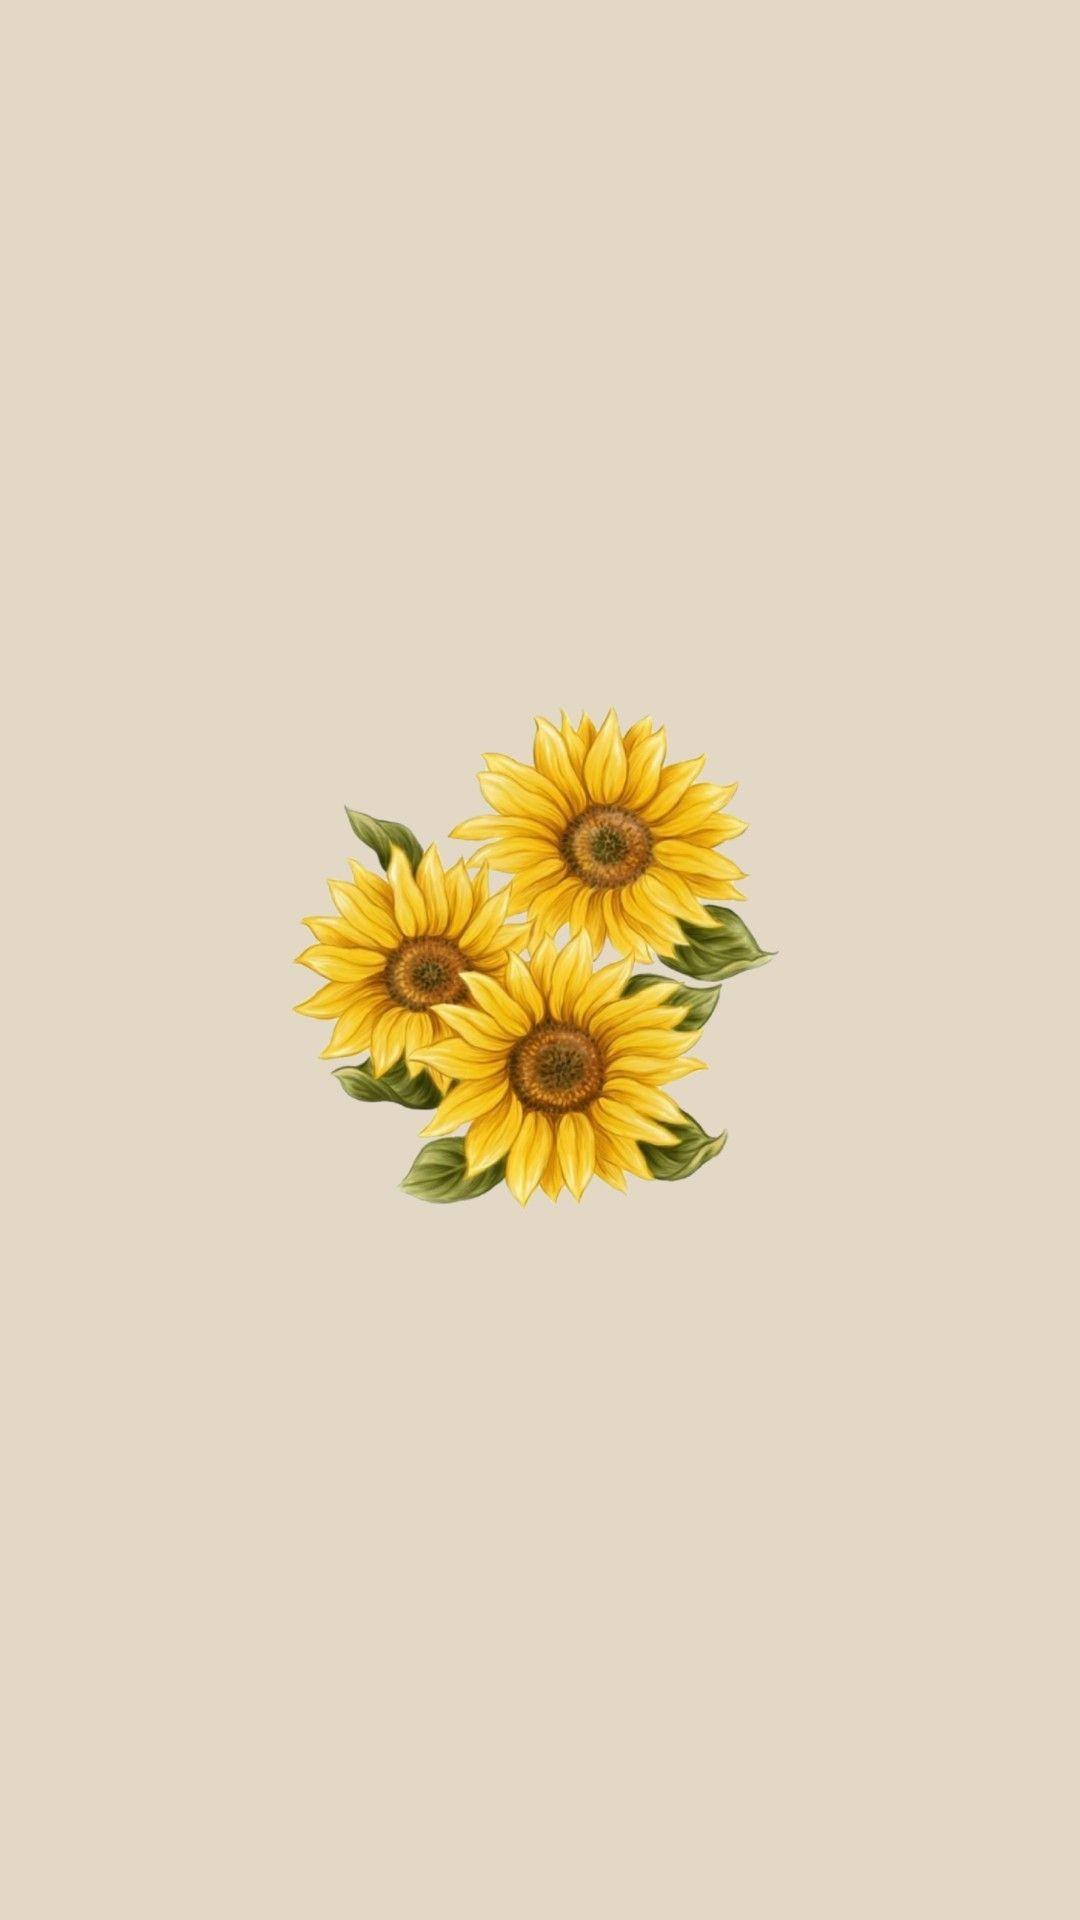 Pin By Dri Gibelini On Wallpaper Sunflower Wallpaper Yellow Wallpaper Sunflower Iphone Wallpaper